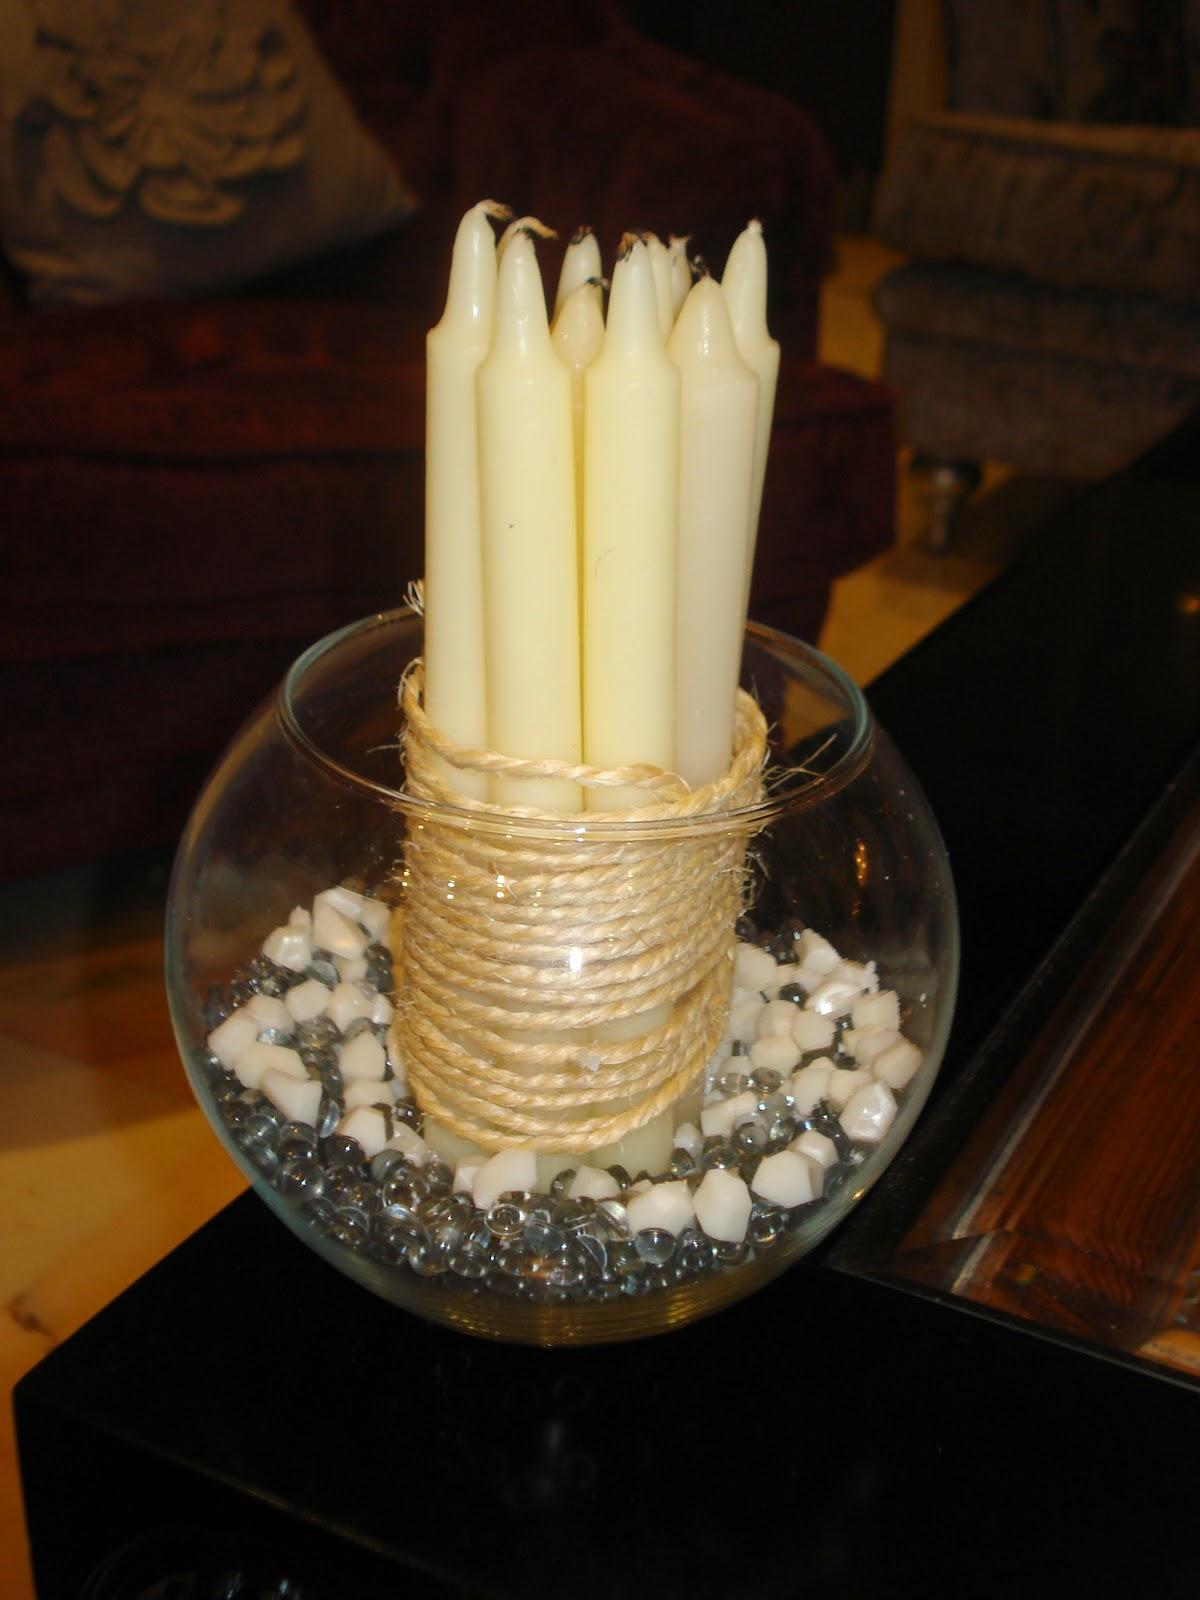 Las casas de pura centros de mesa decorativos - Centros con velas ...